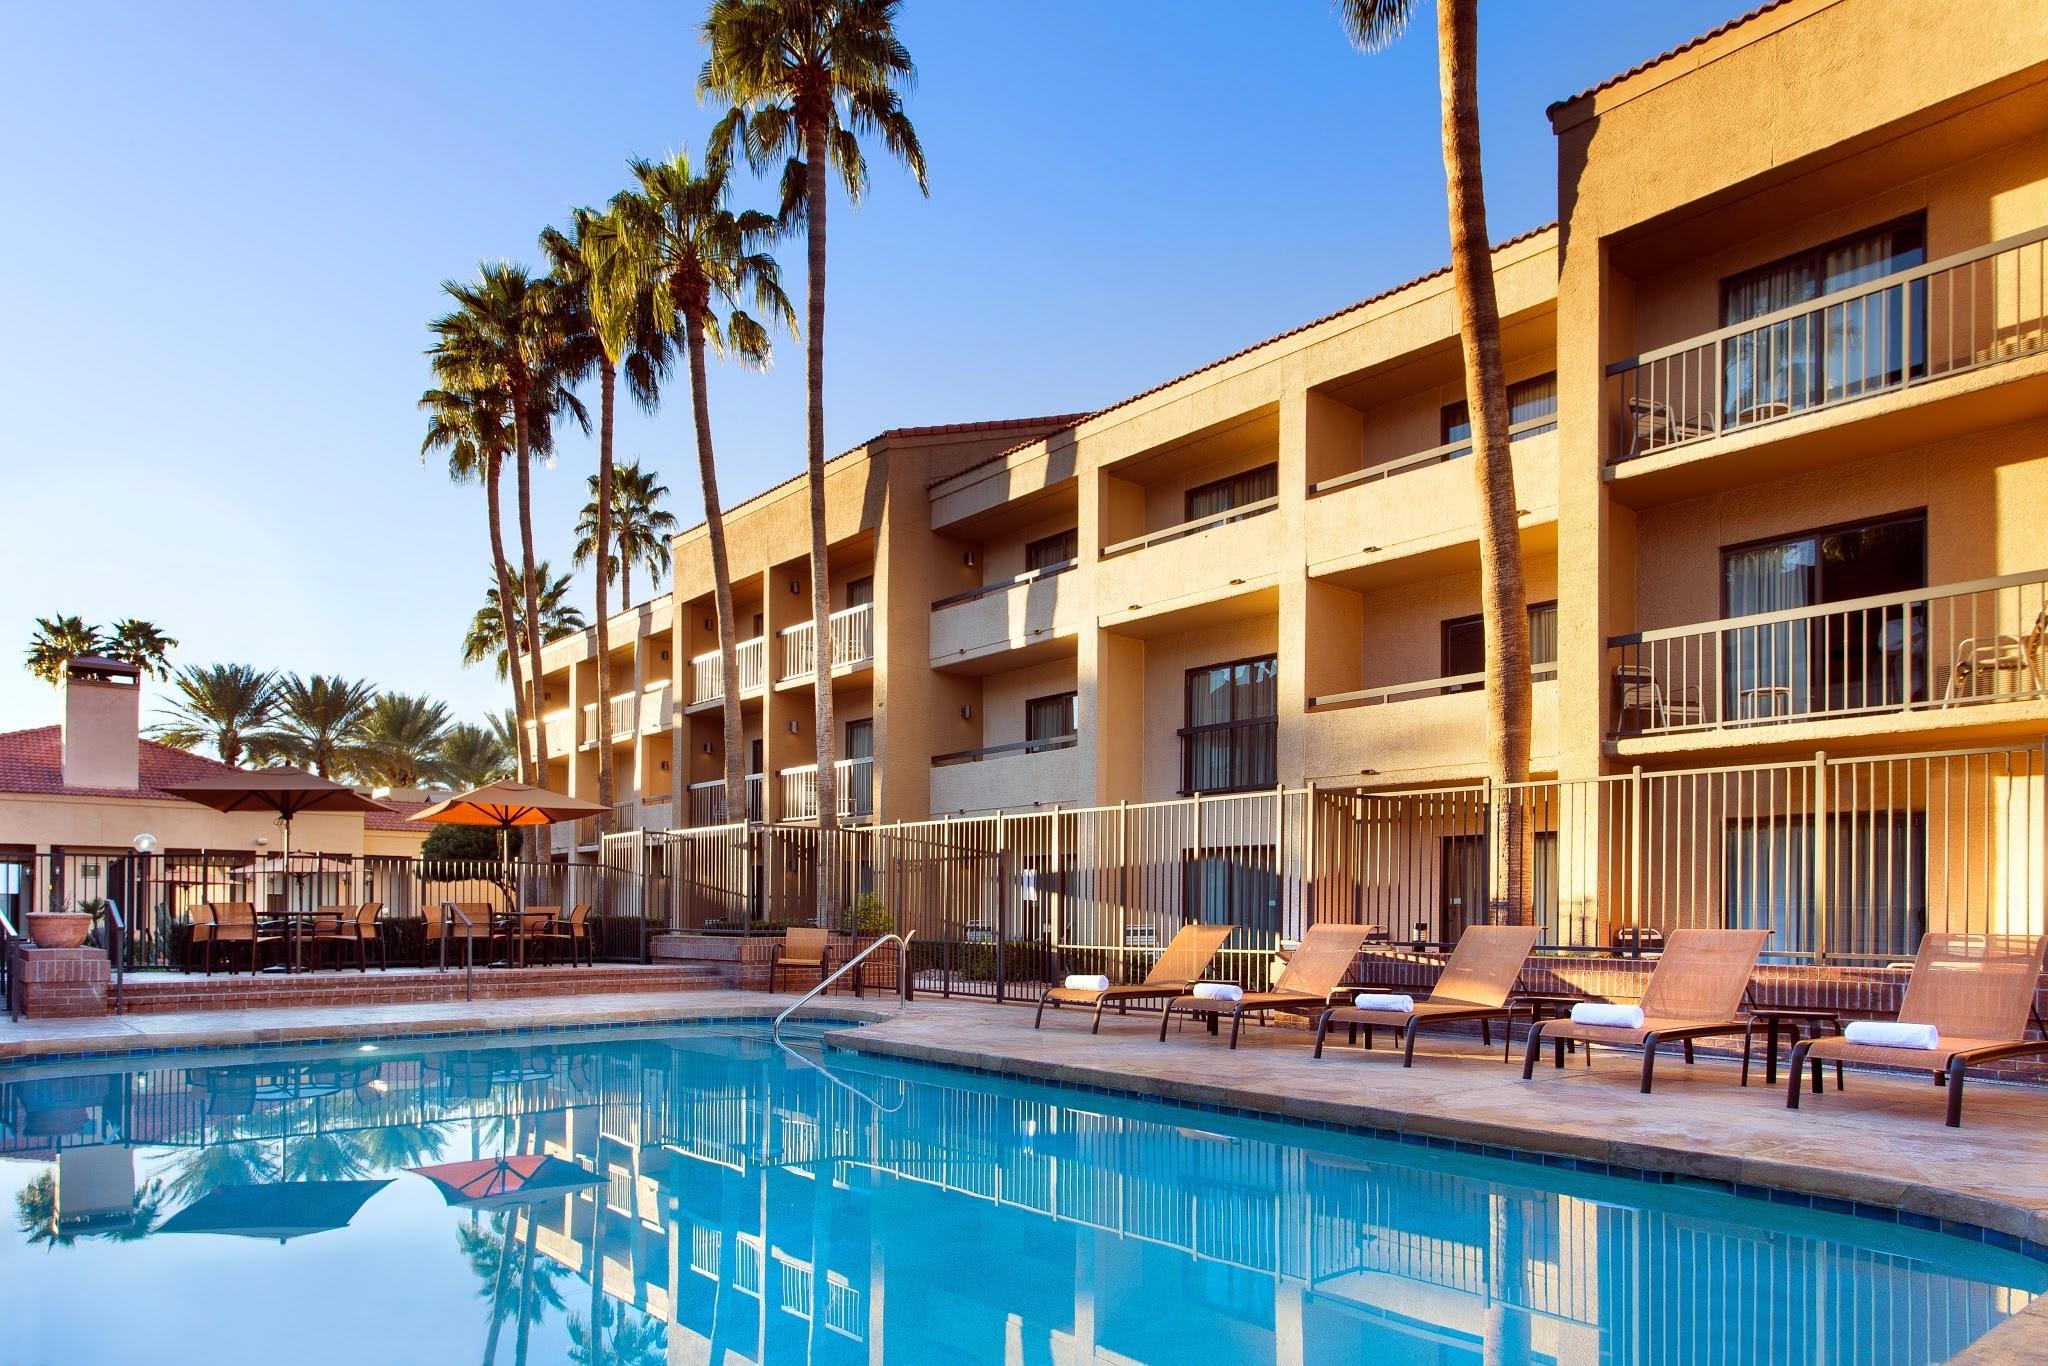 Phoenix, Arizona Hotels from $42! - Cheap Hotel Deals